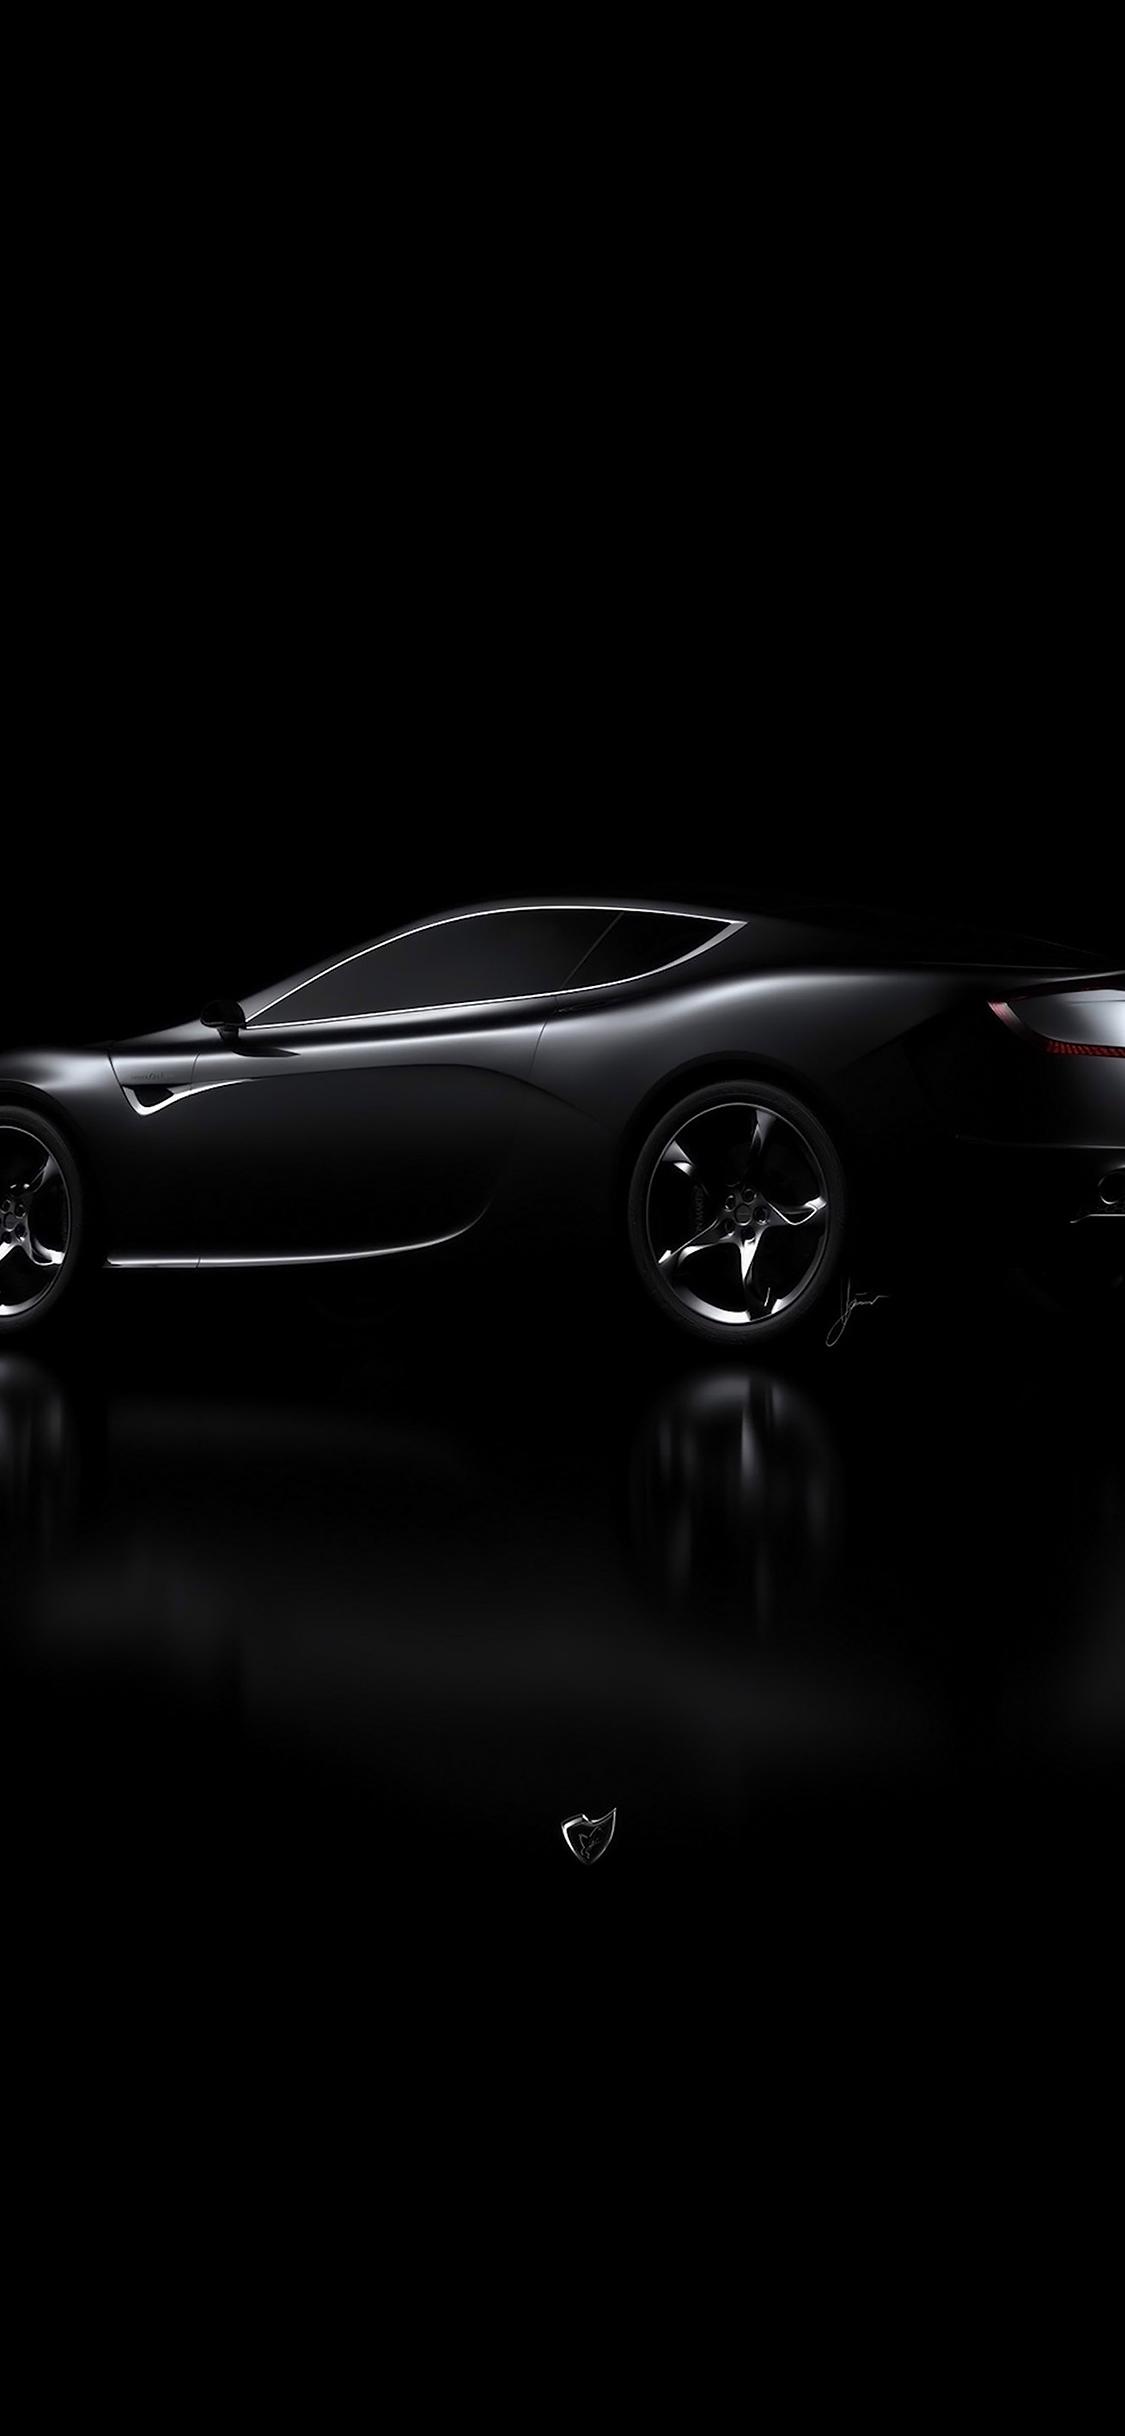 Aj06 Aston Martin Black Car Dark Wallpaper